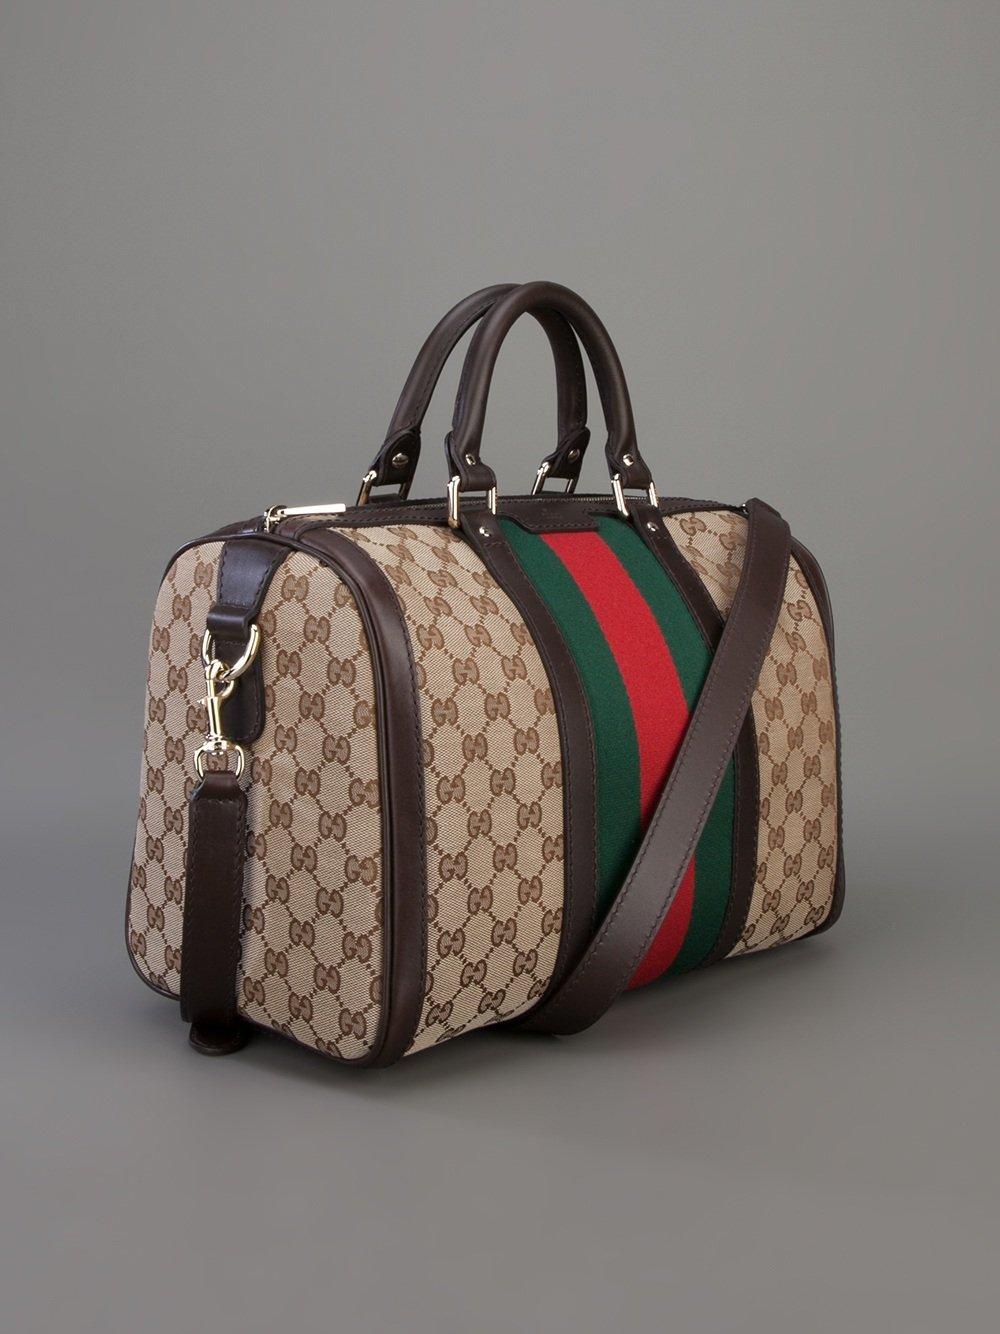 Boston Bag Patchwork Tutorial: Gucci Vintage Web Boston Bag In Brown